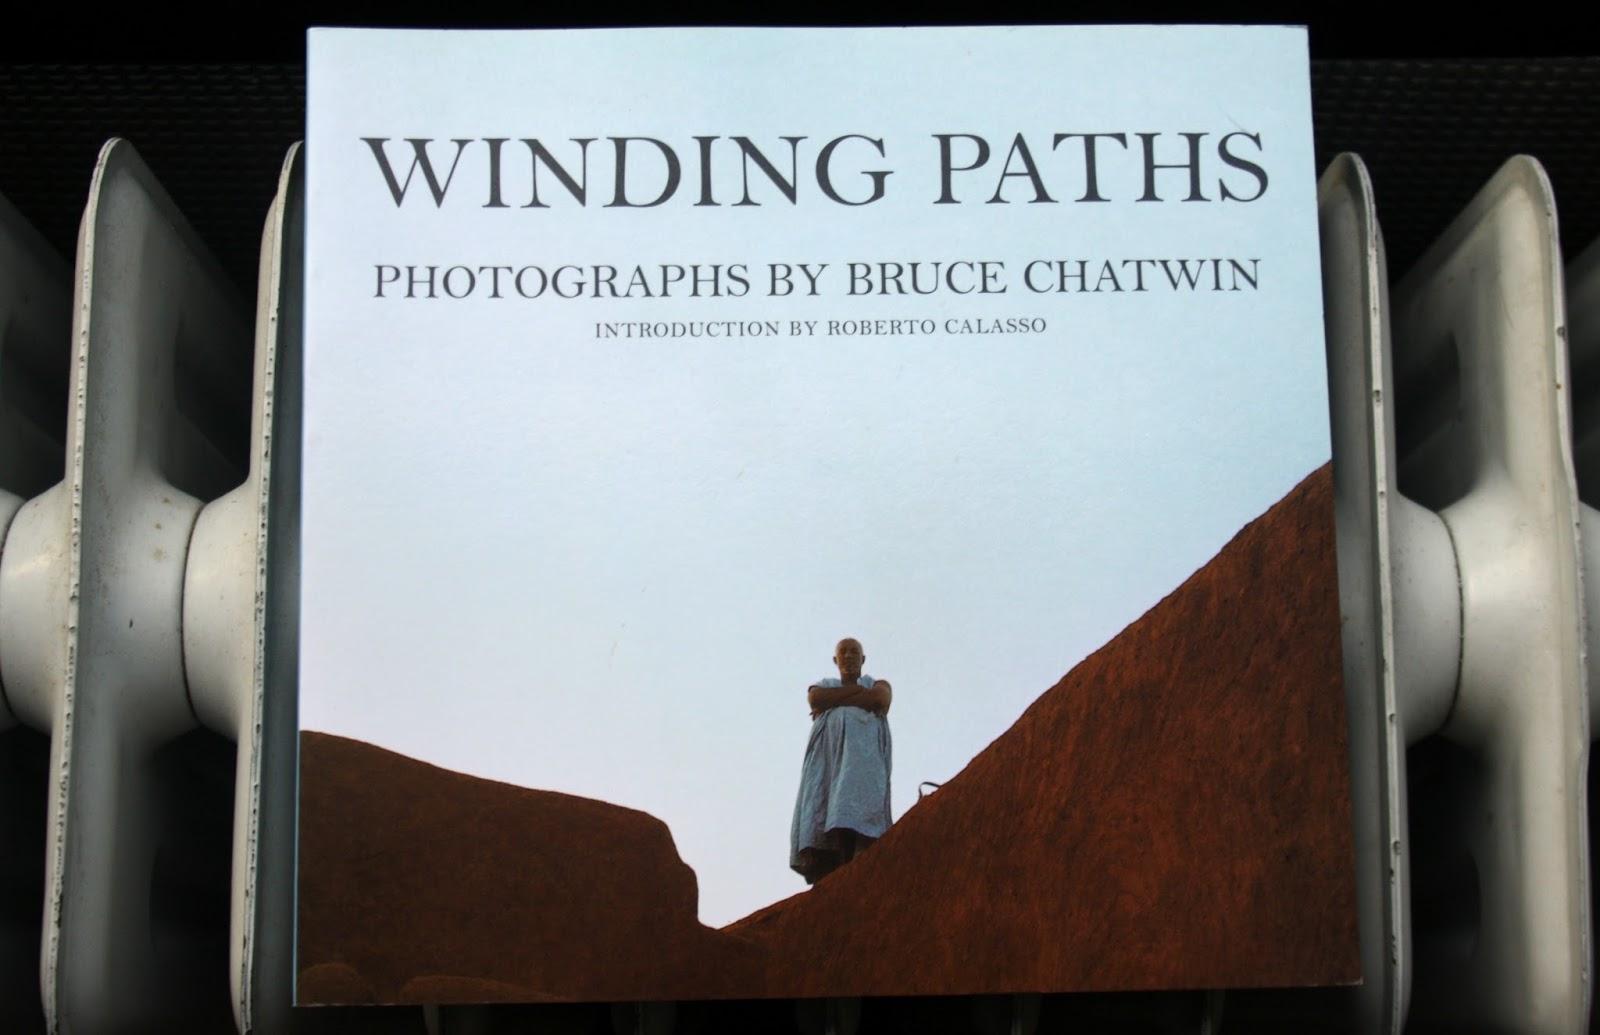 Citaten Uit Bint : Bint photobooks on internet the africa that i have loved winding